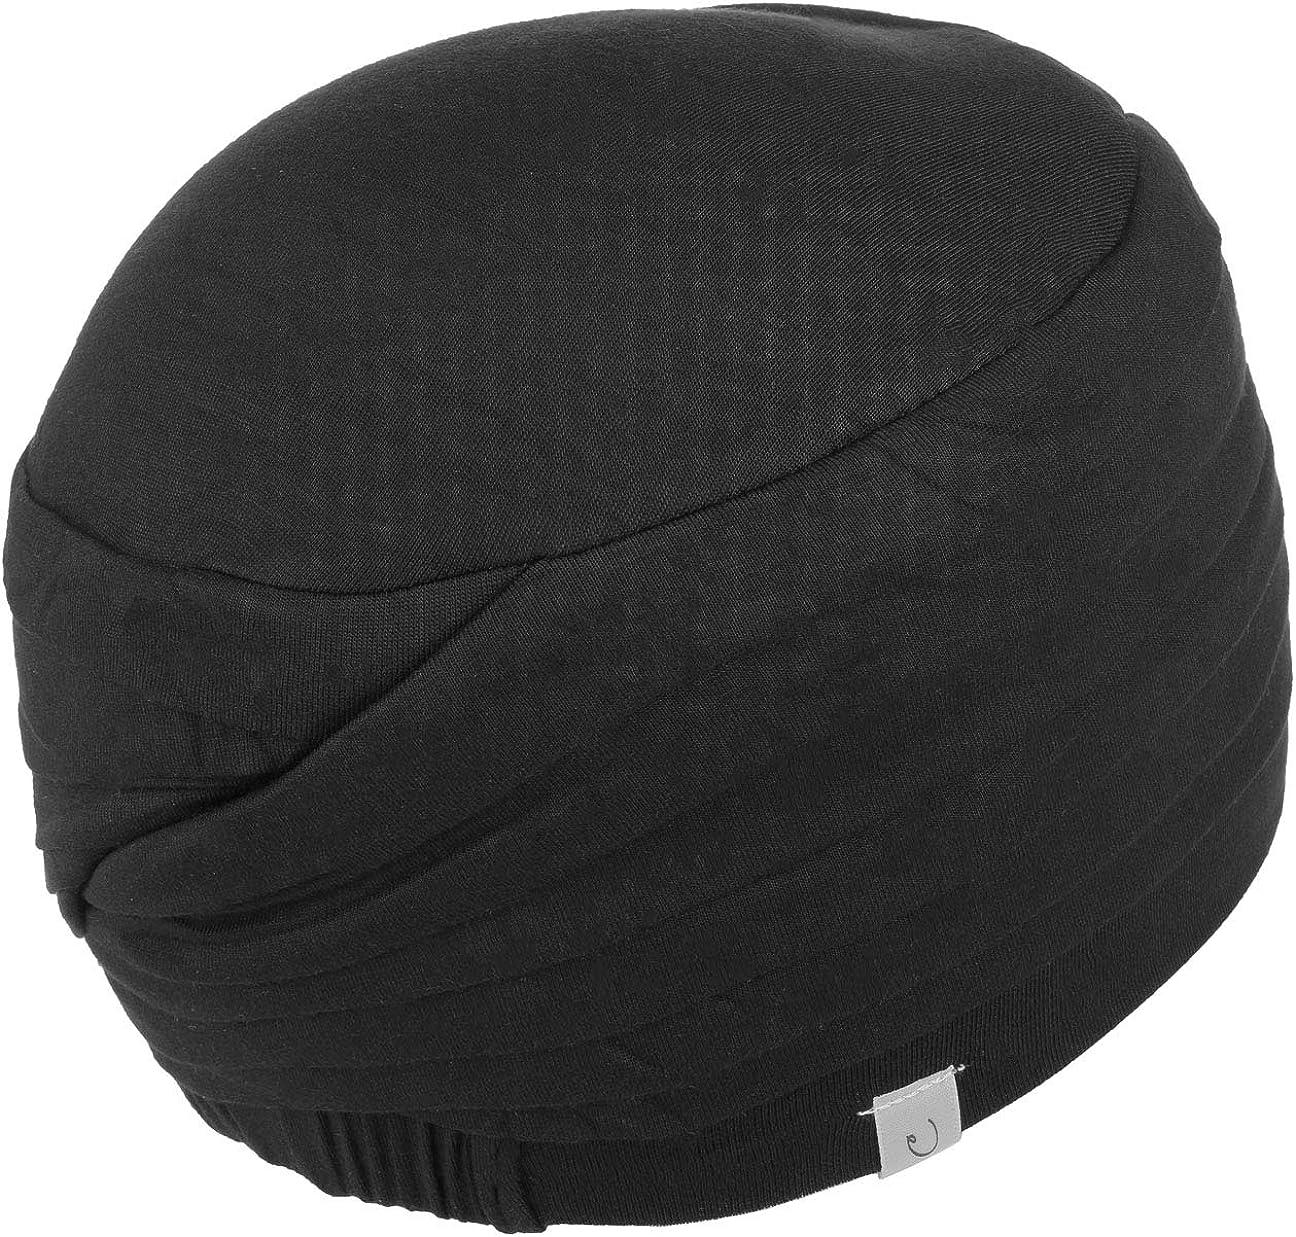 Christine Headwear Shanti Uni Bambus Turban Kopftuch Damenturban Chemo-Kopfbedeckung